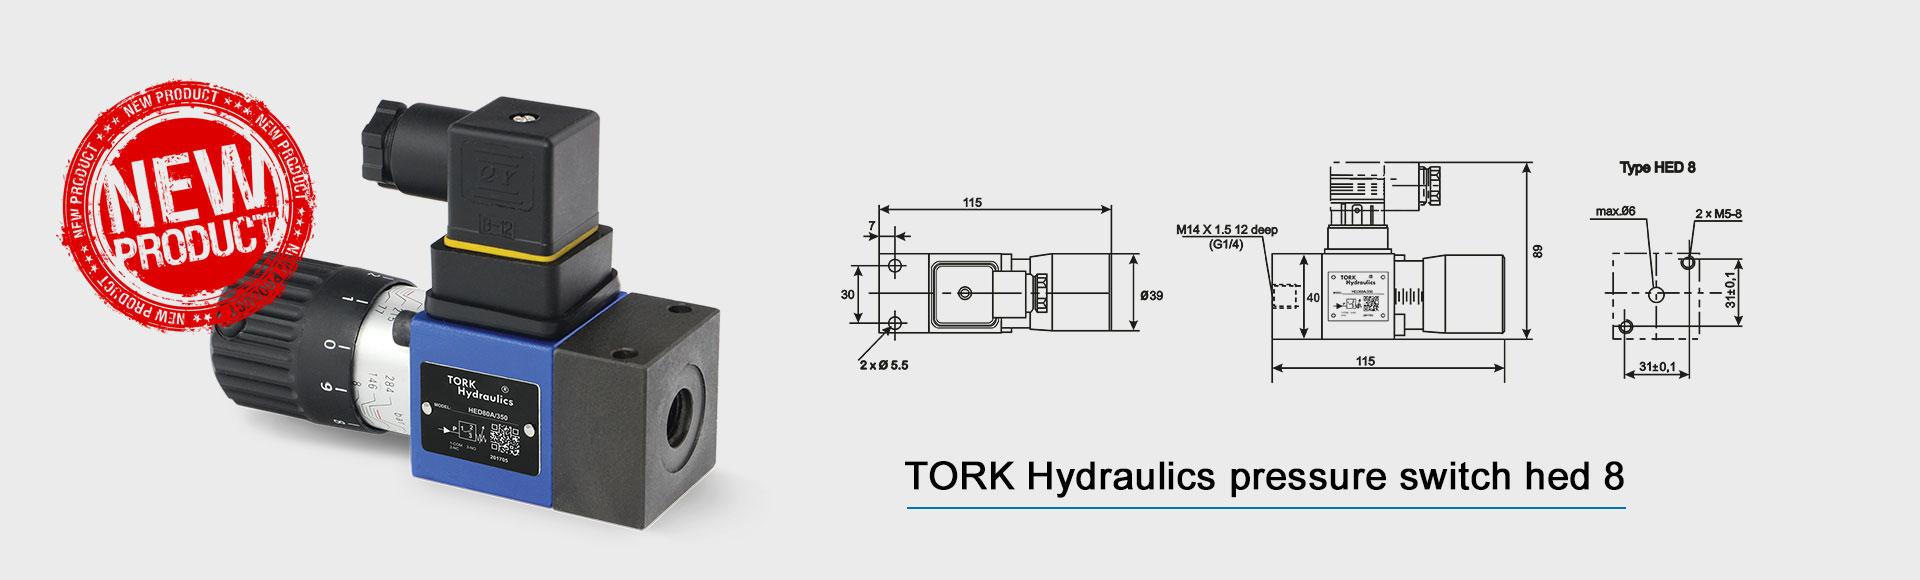 tork-hydraulics-pressure-switch-hed-8